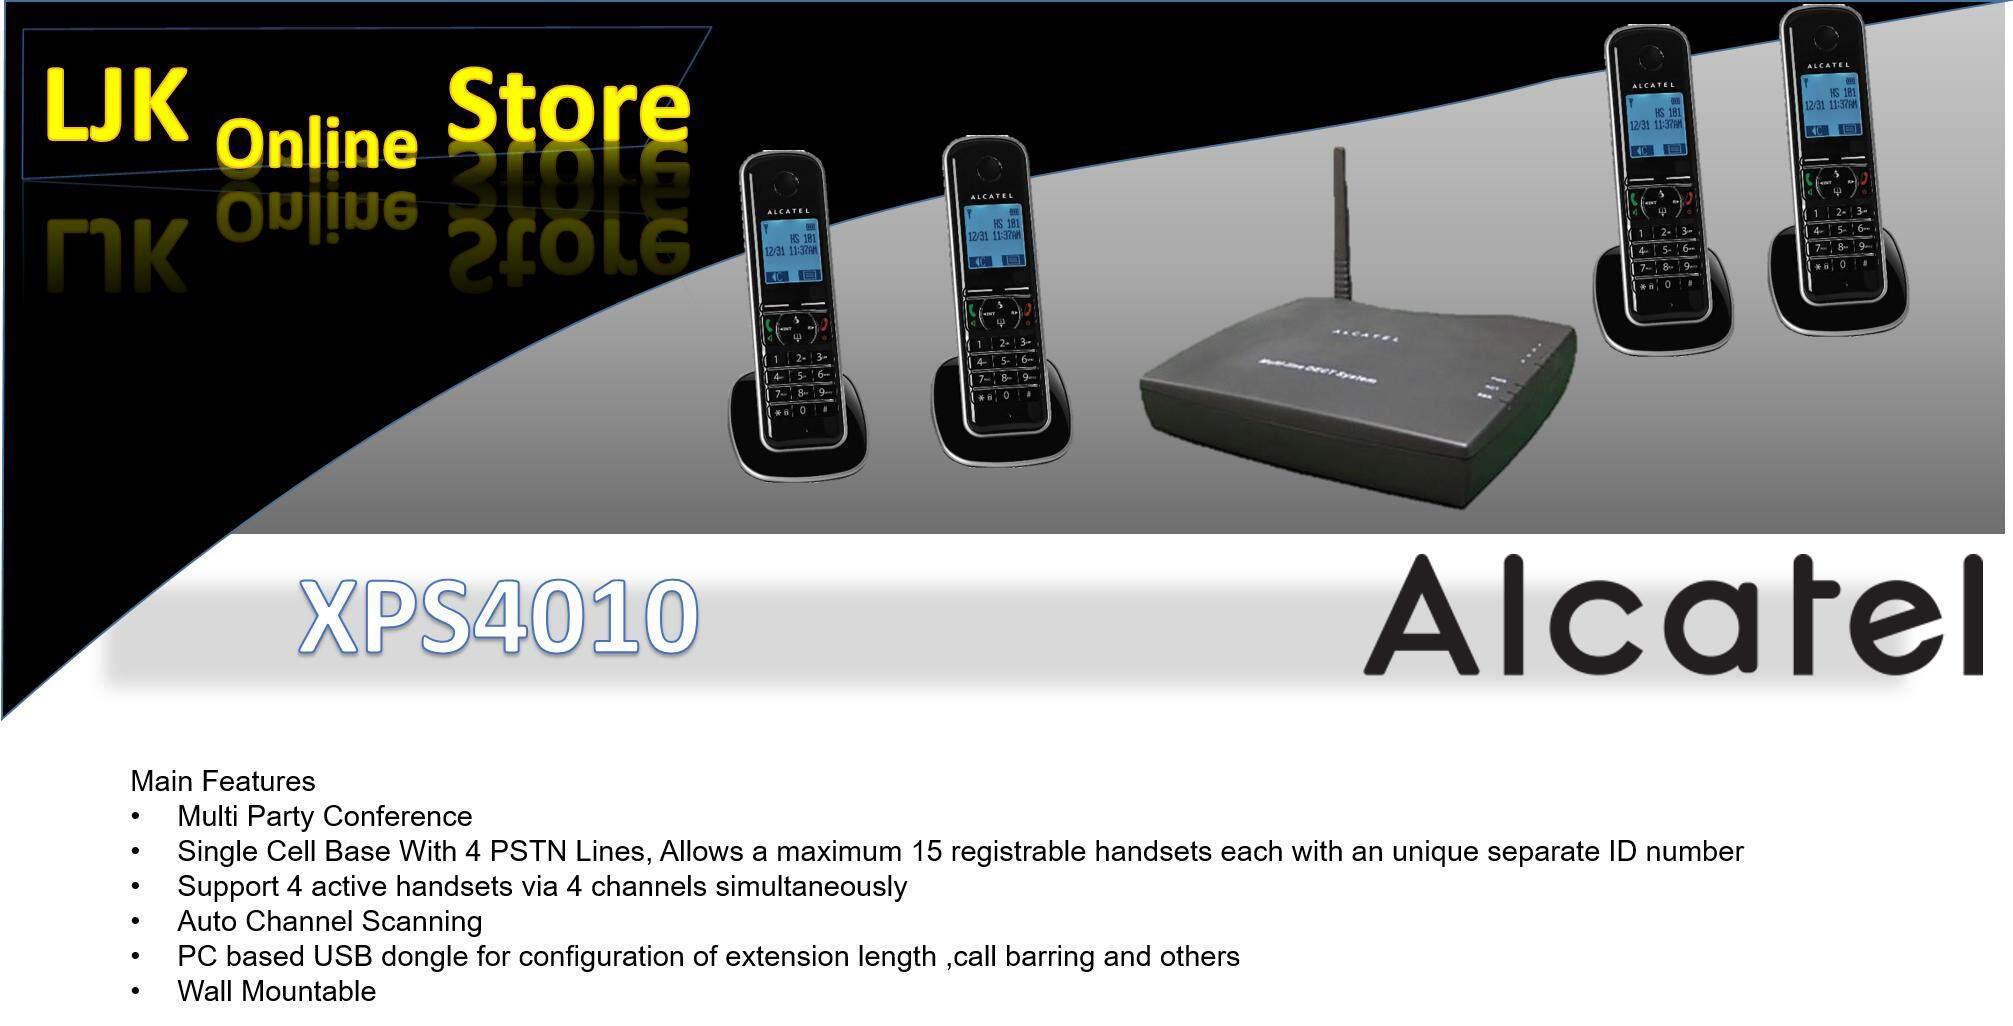 Alcatel XPS 4010